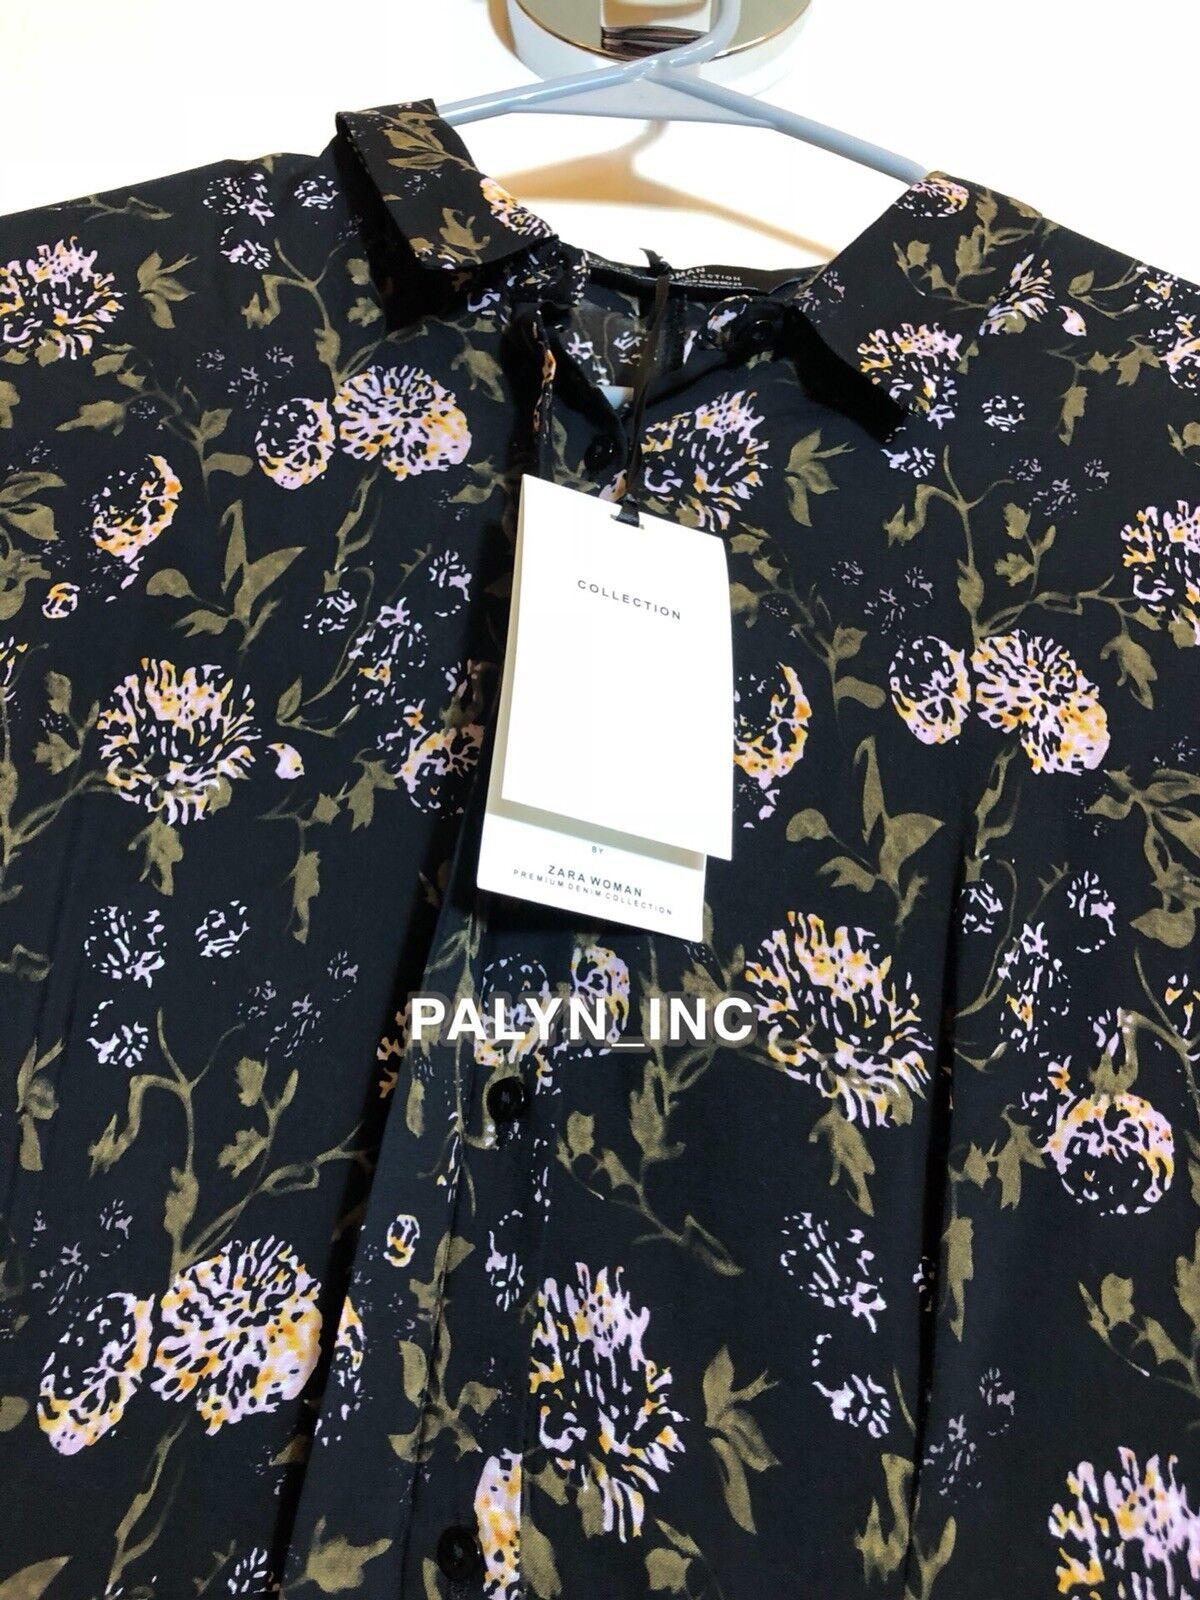 NWT ZARA AW18 FLOWING LONG FLORAL PRINT SHIRT DRESS BLACK 4786//275 /_XS S M L XL